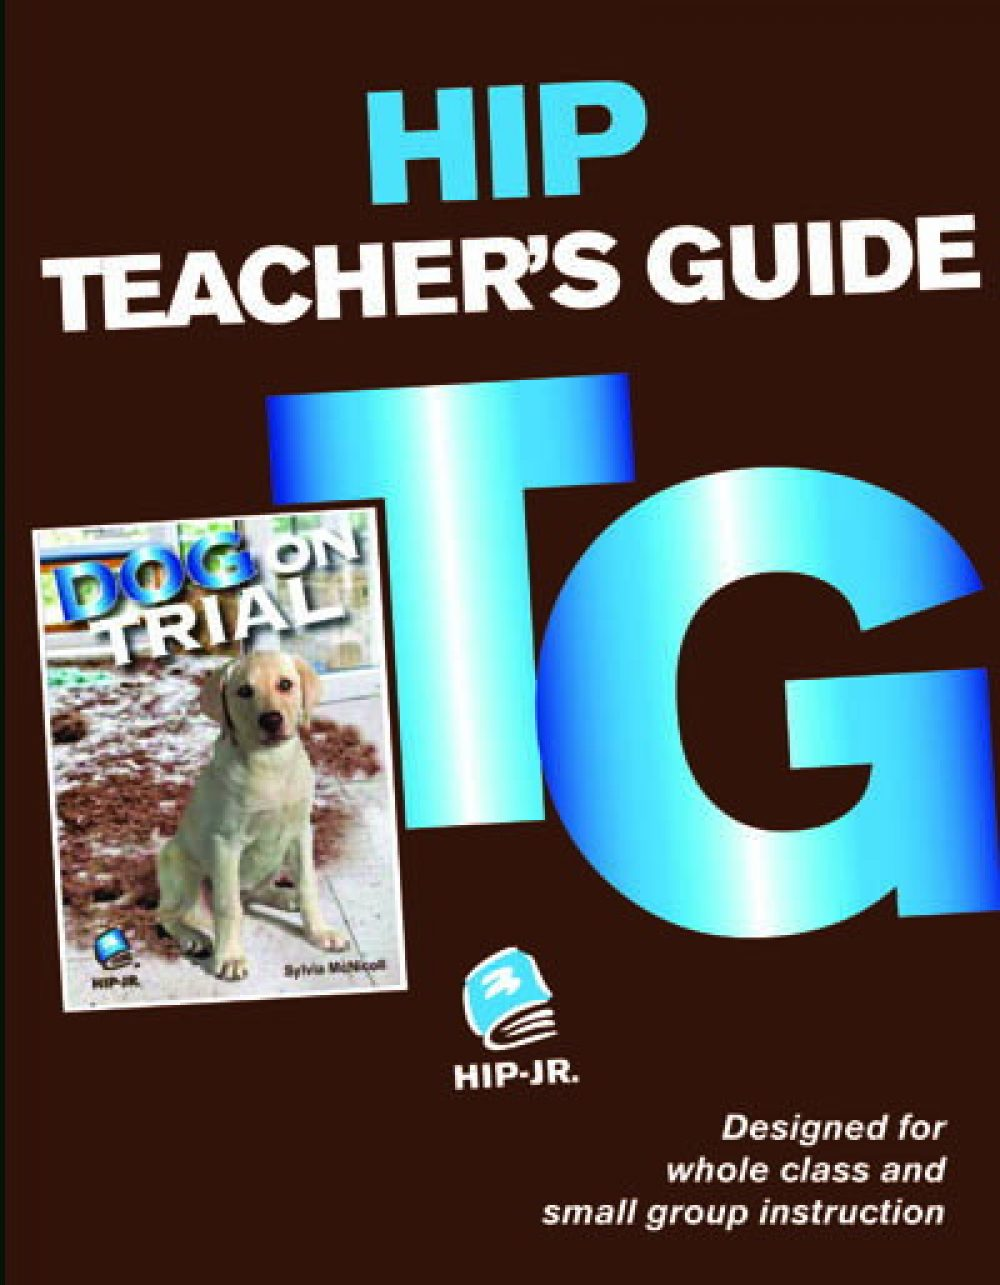 Dog on Trial Teacher's Guide